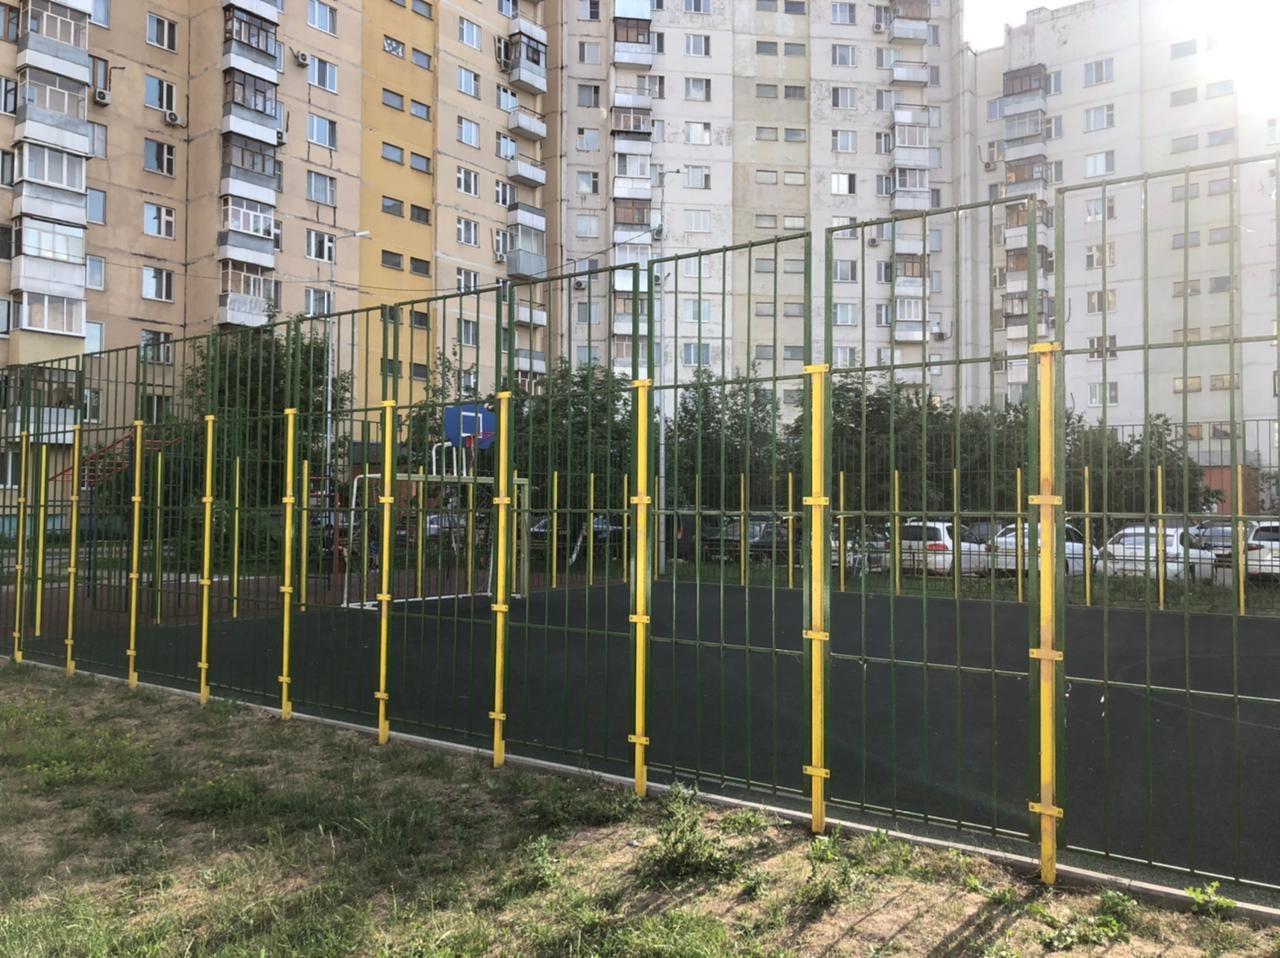 Продам двухкомнатную (2-комн.) квартиру, Ямашева пр-кт, 61, Казань г